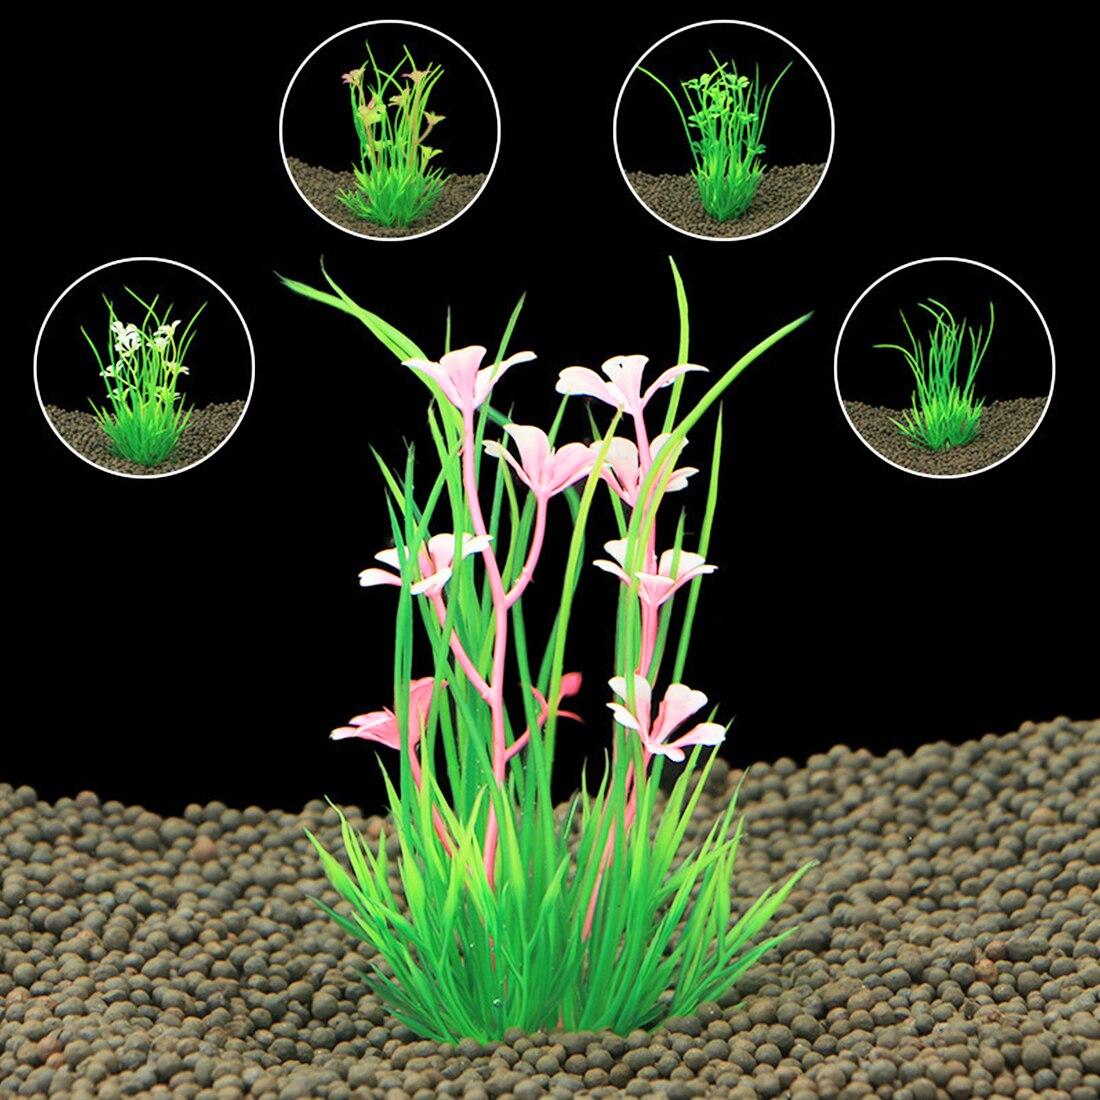 1PC  NEW Artificial Plastic aquarium plants Grass for aquarium background Fish Tank Aquarium Ornament decoration